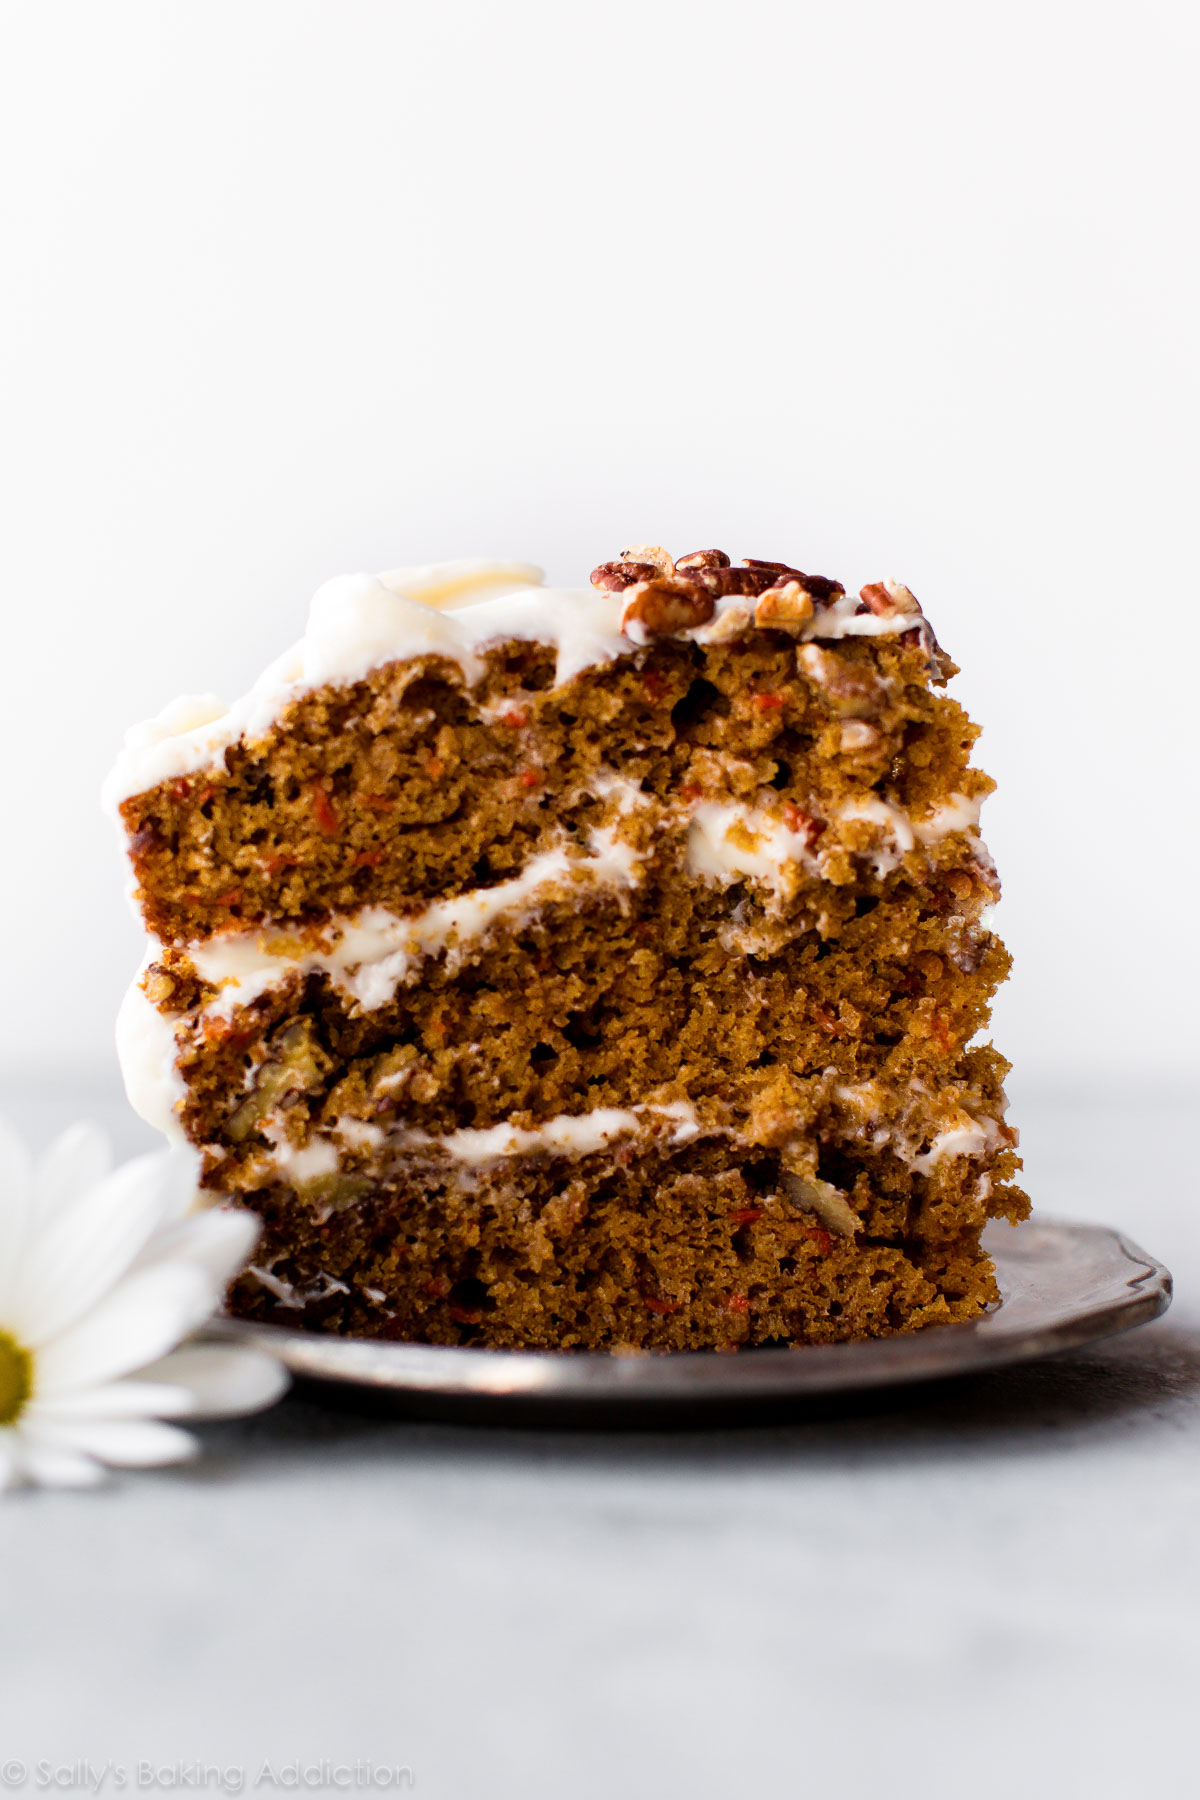 Carrot/Zucchini Cake   Sally's Baking Addiction